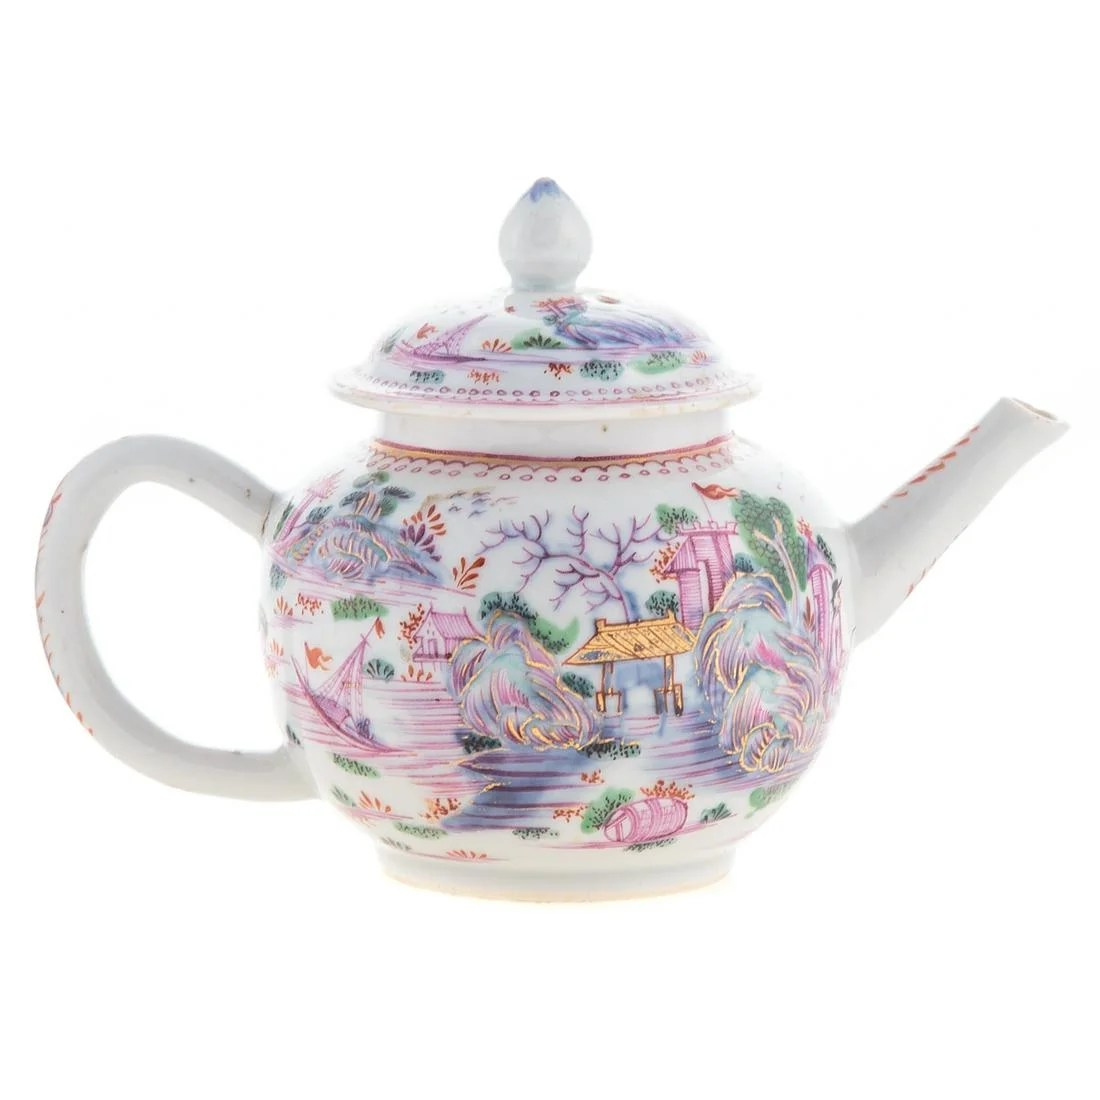 Chinese Export Globular Teapot in Meissen Manner